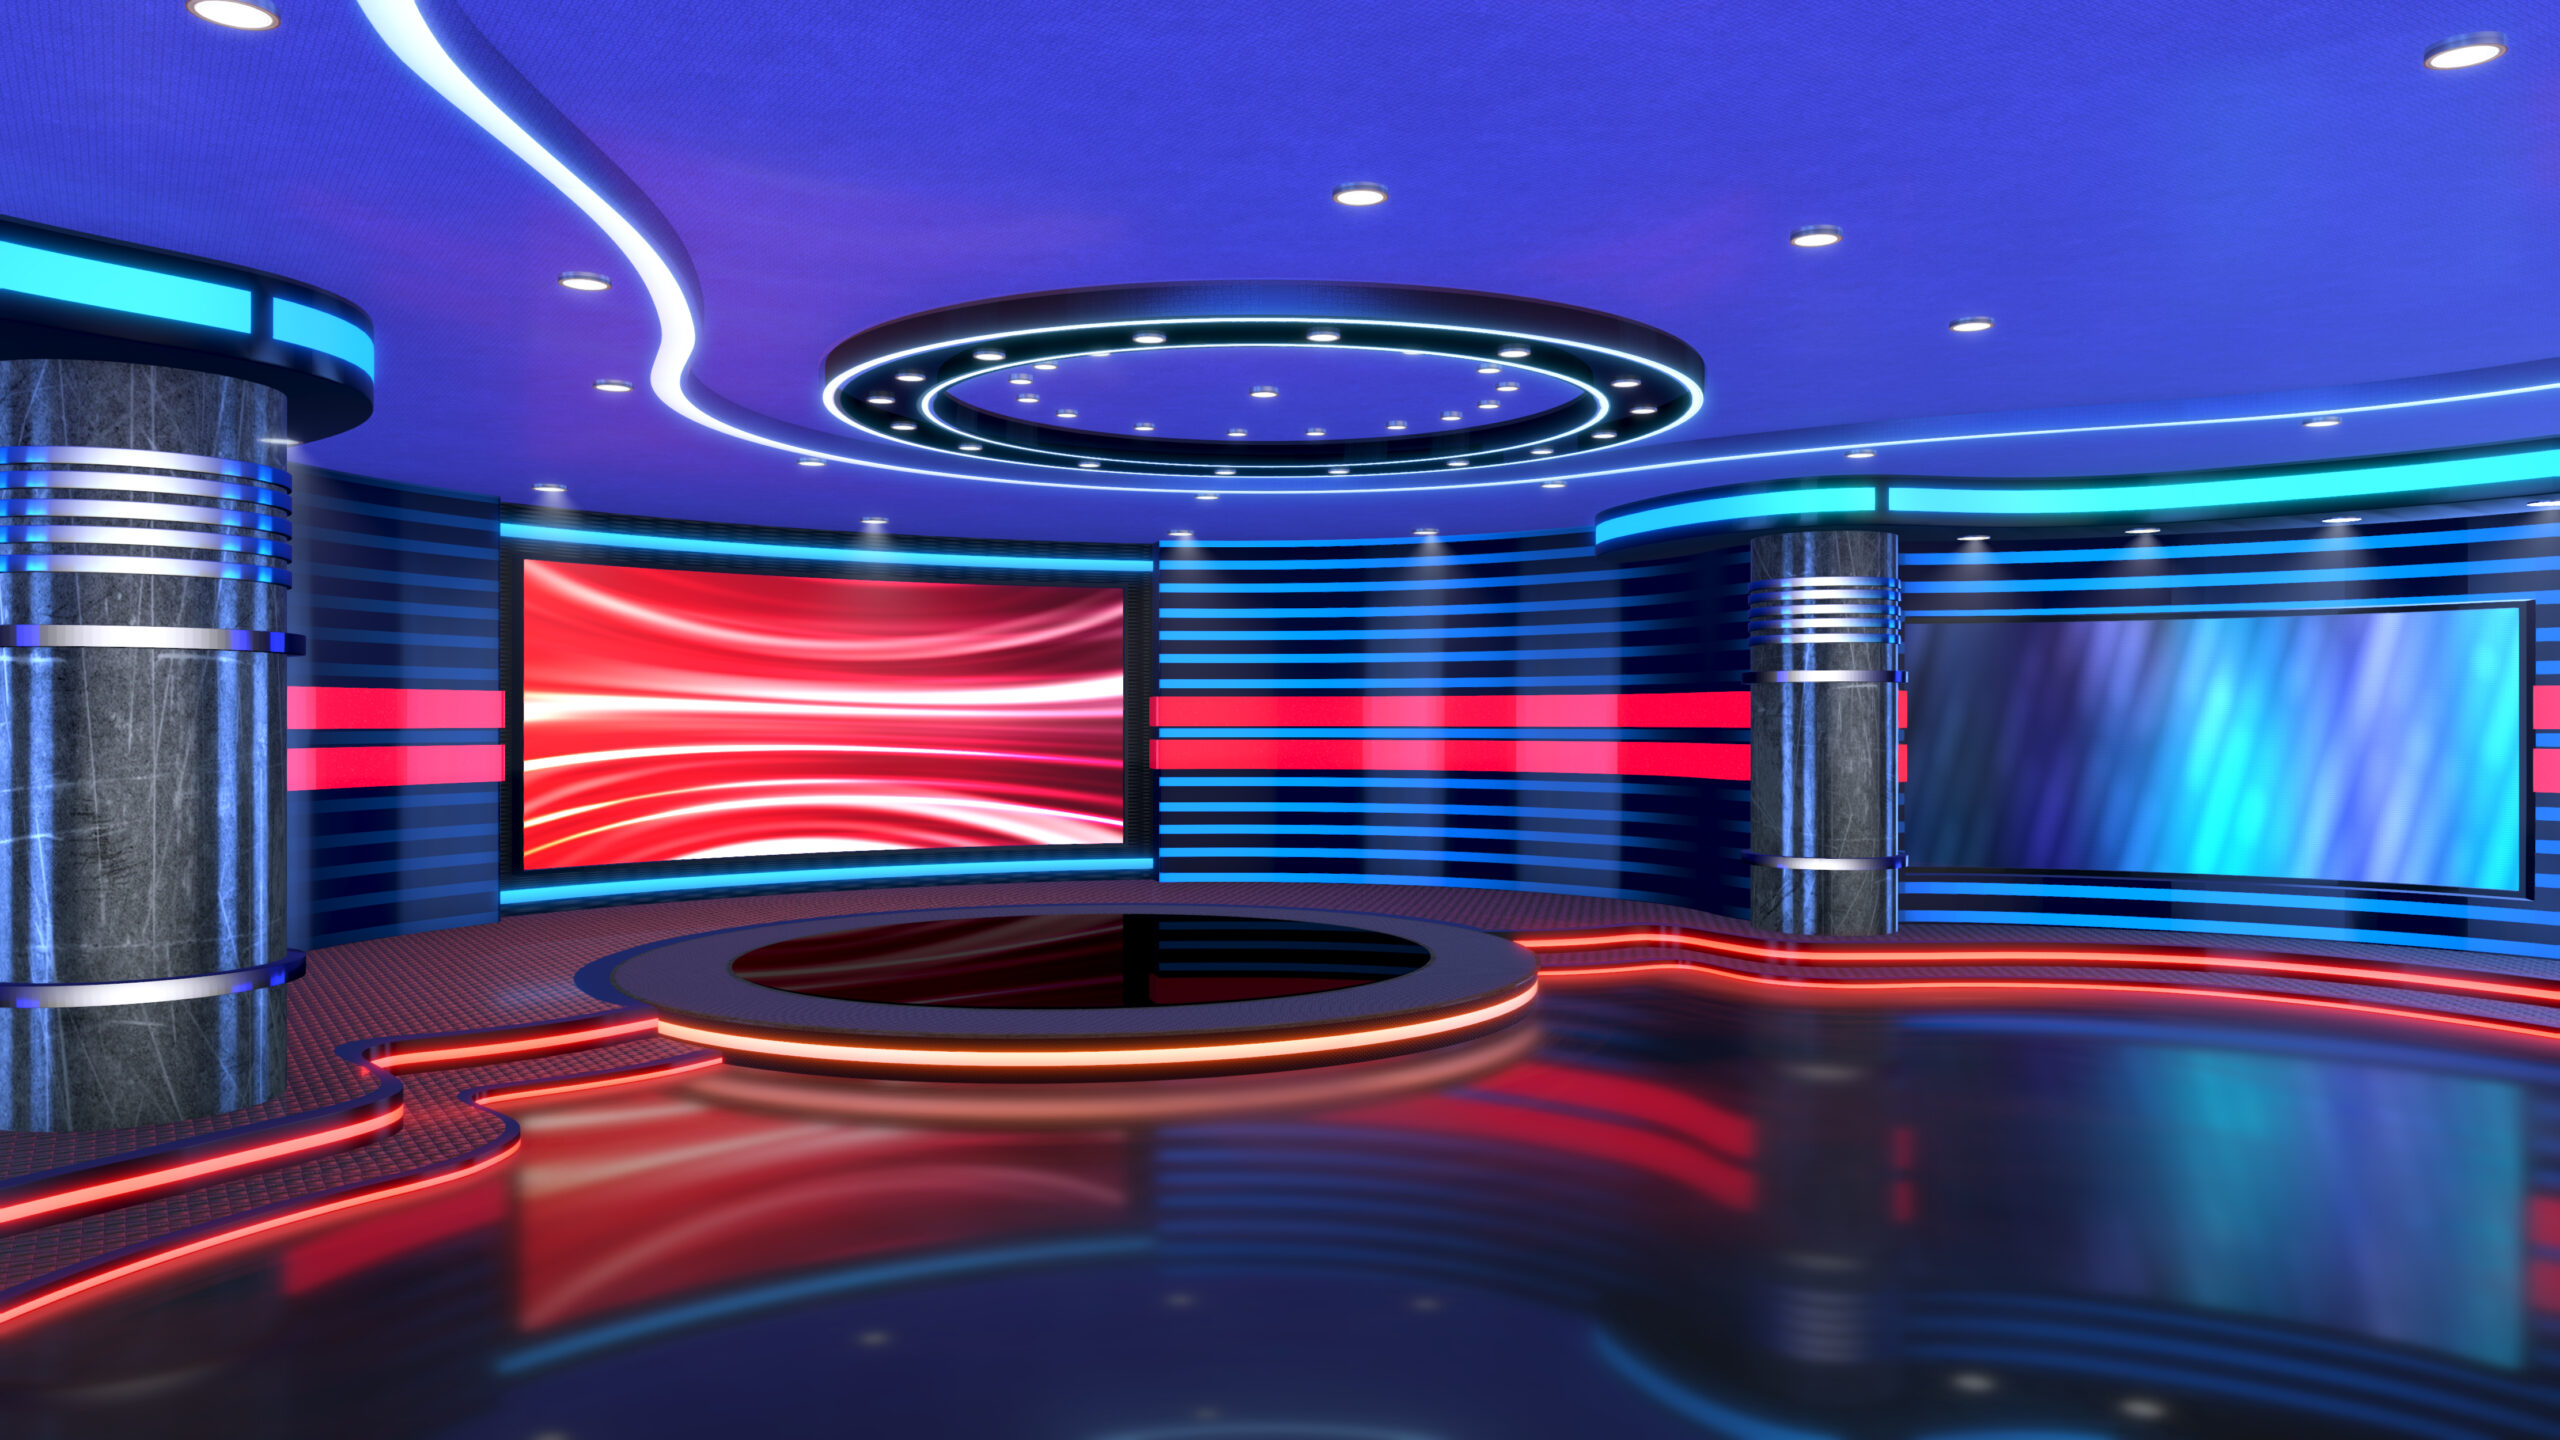 Television studio, virtual studio set. ideal for green screen compositing.